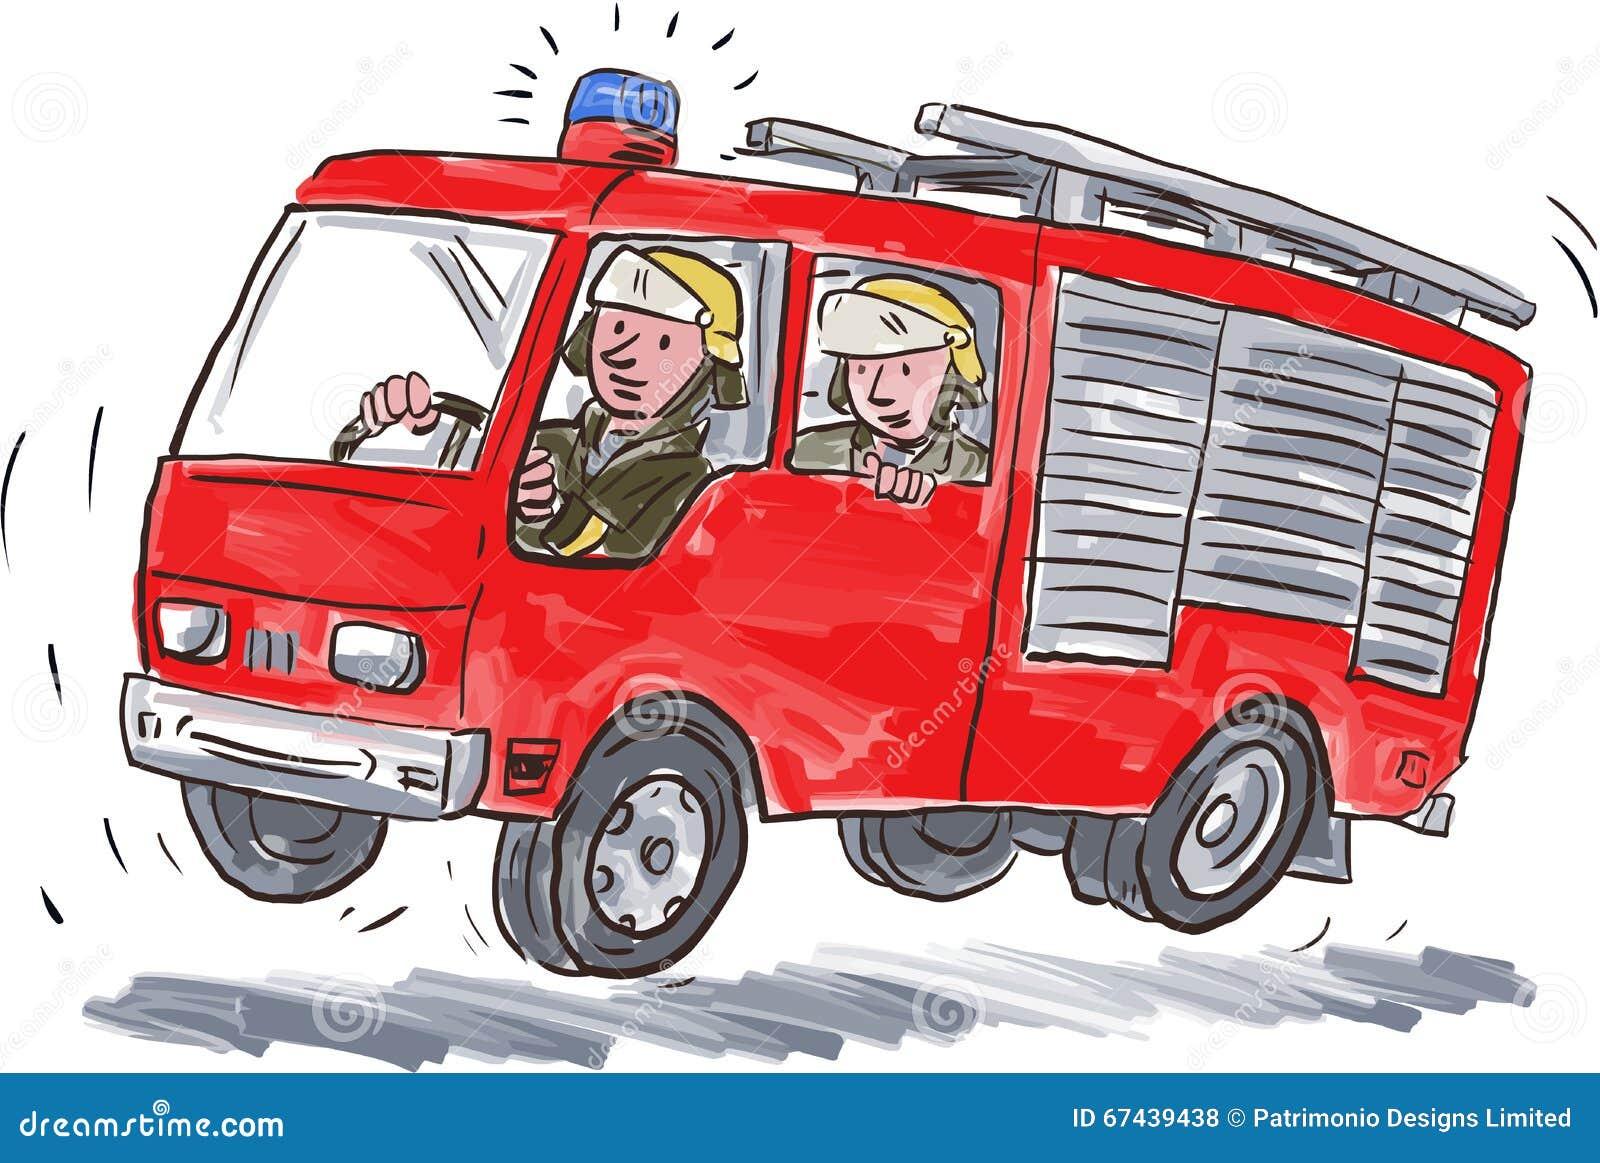 Riding a fireman